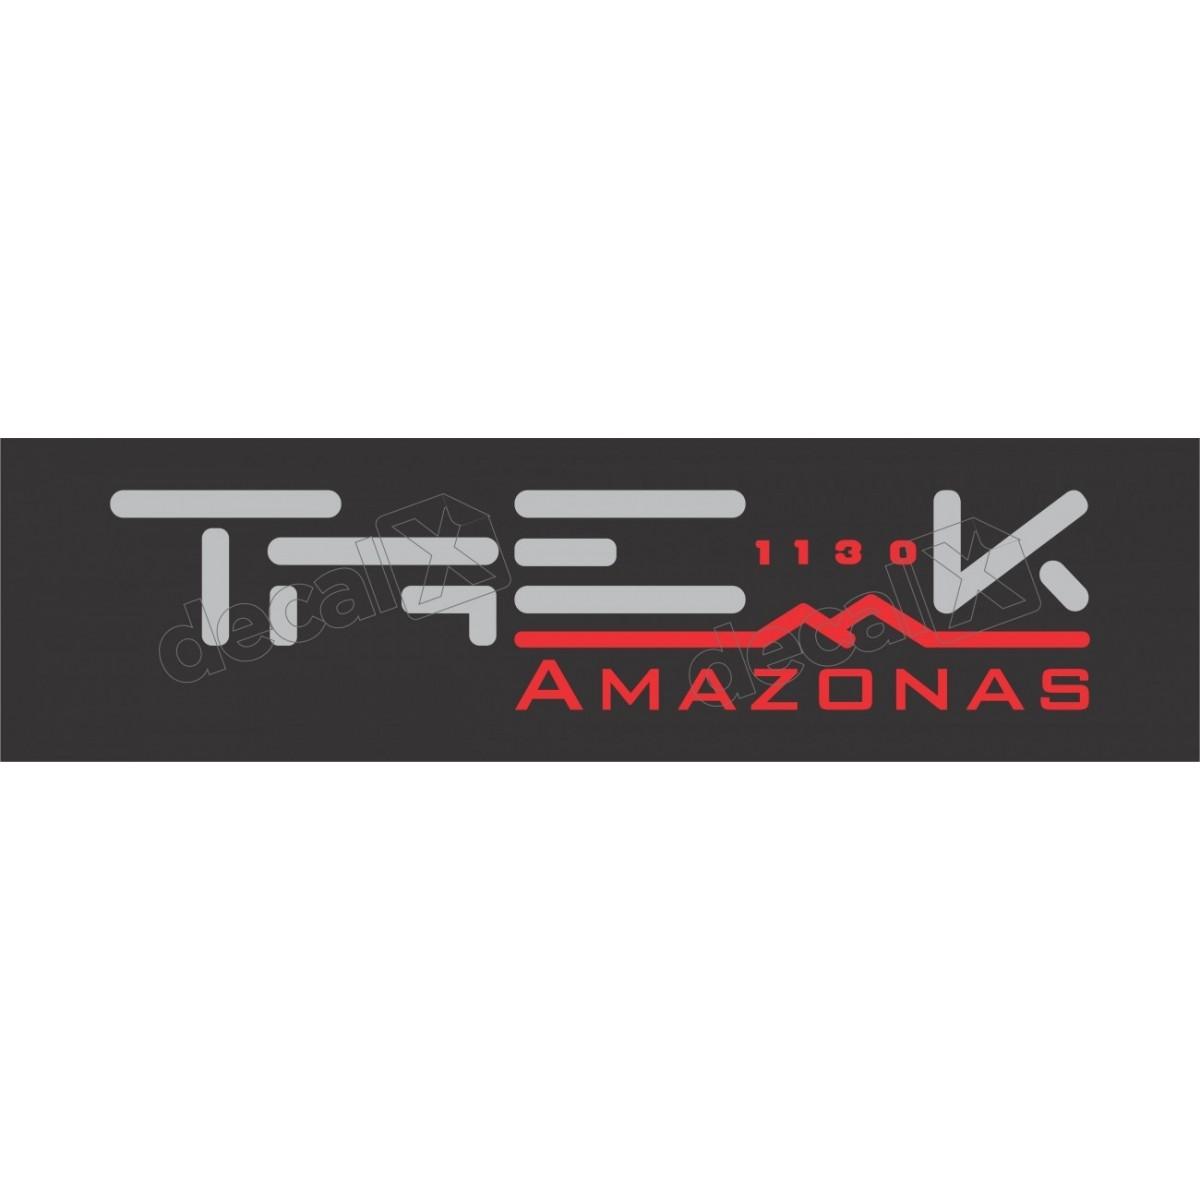 Kit Adesivos Benelli Trek 1130 Amazonas Decalx